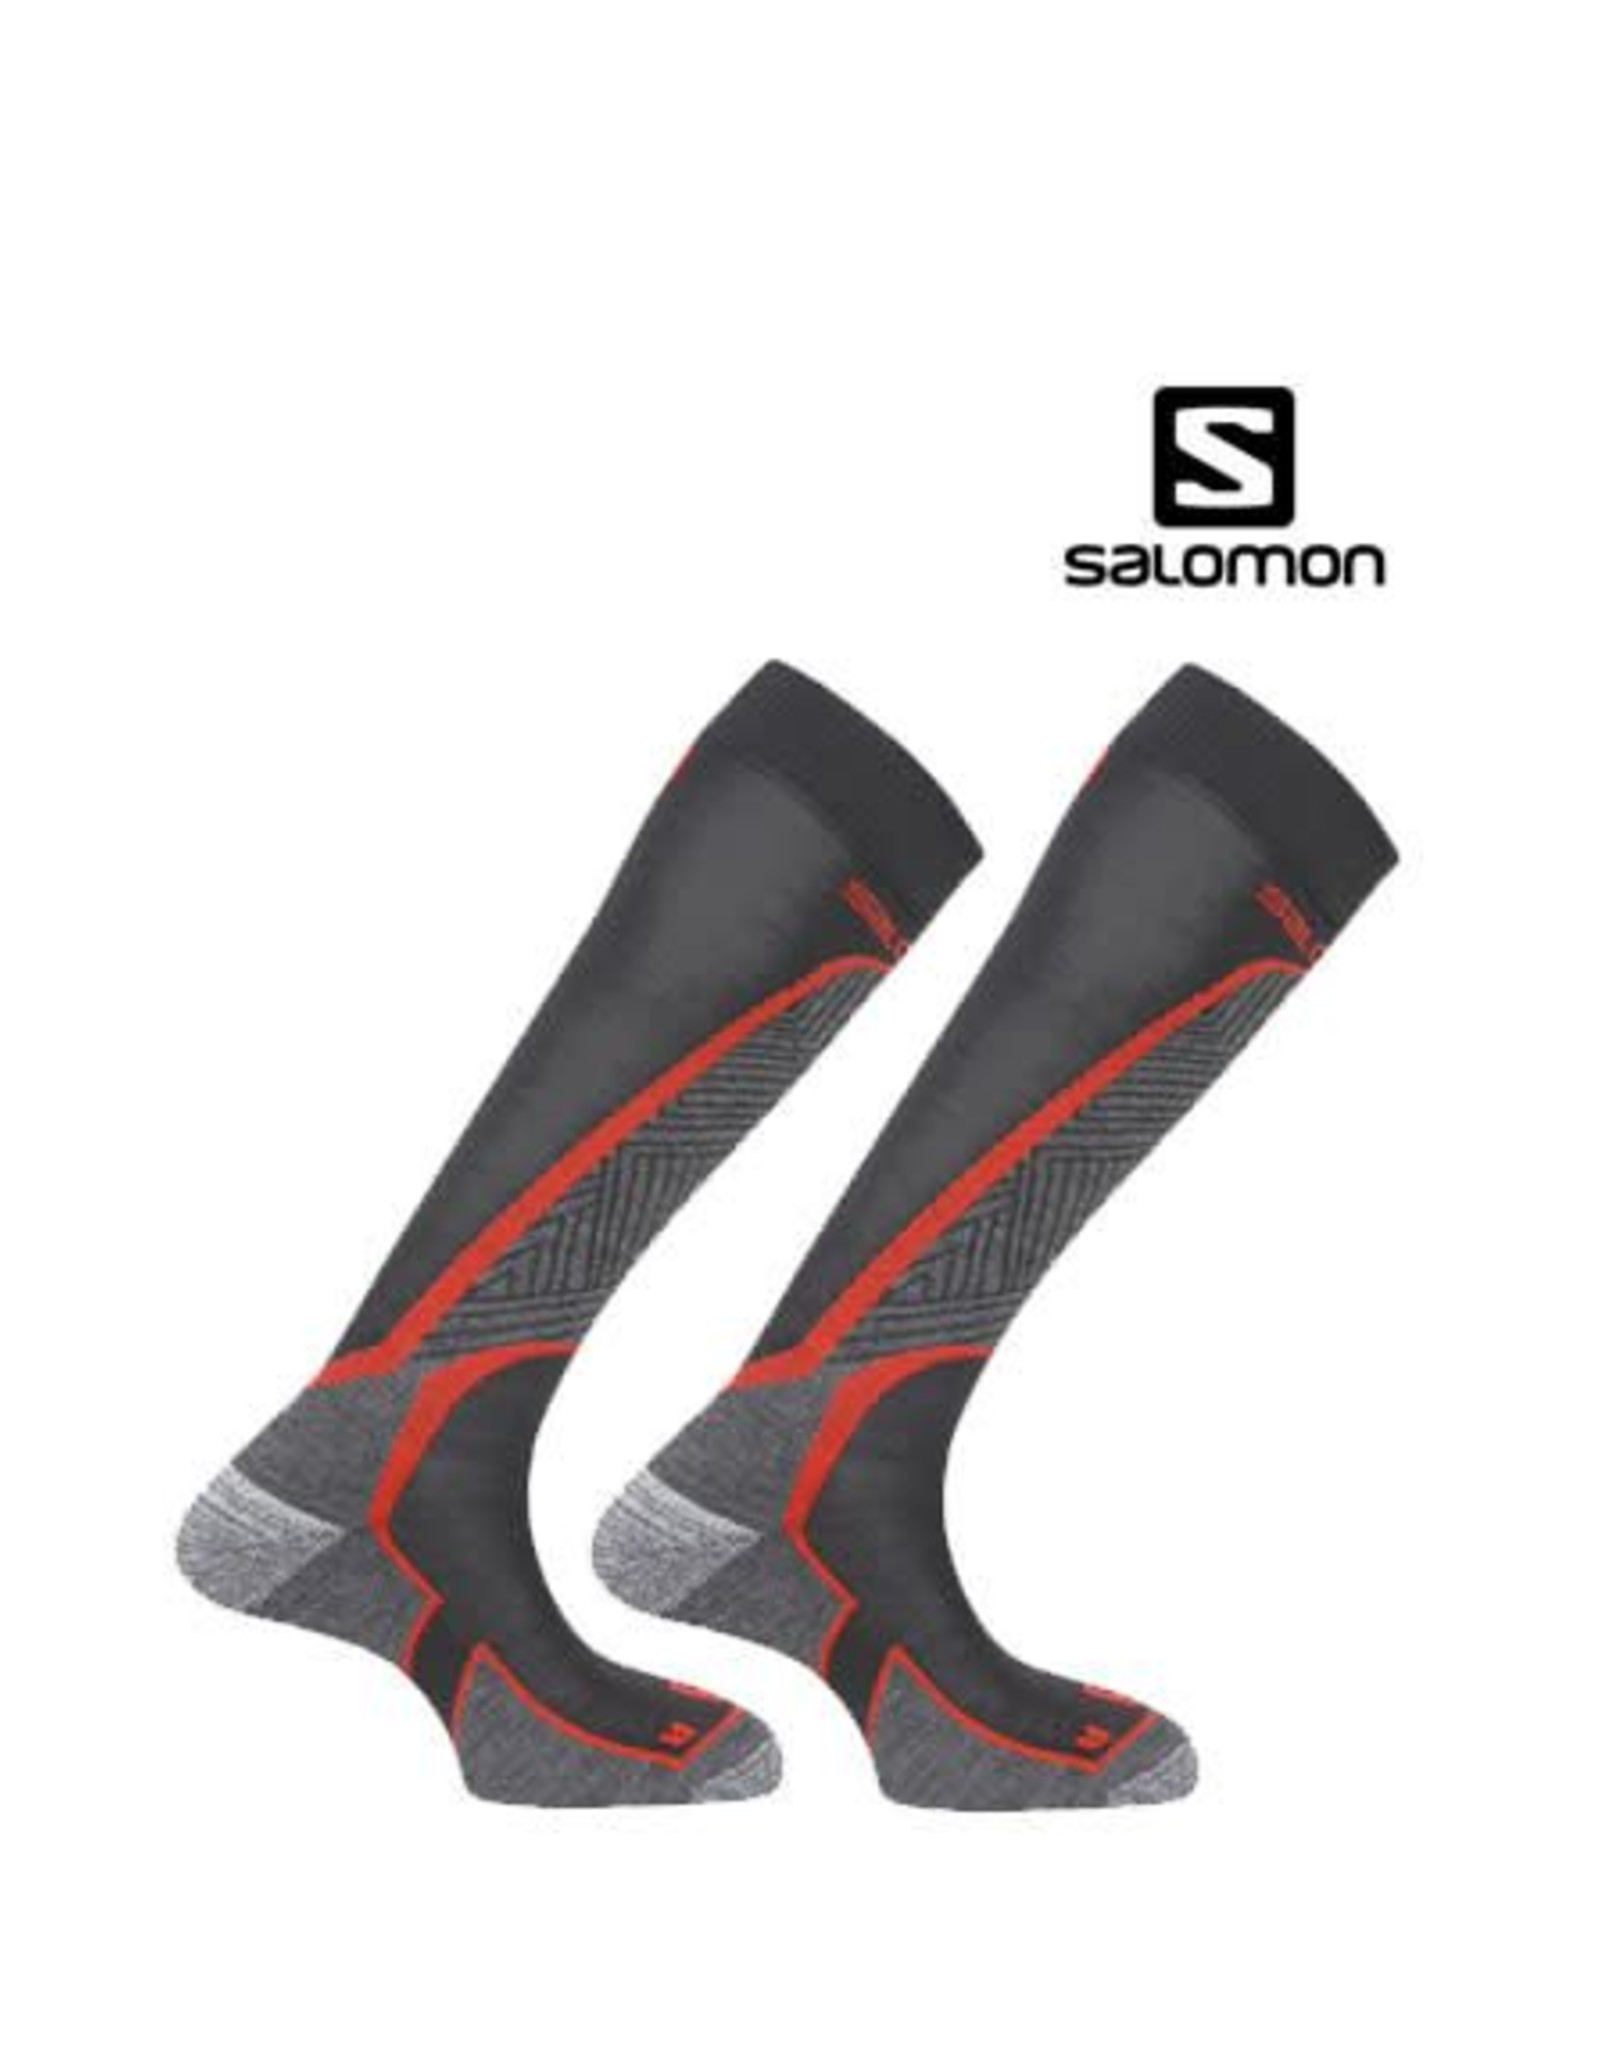 SALOMON SALOMON SKISOKKEN Impact RS